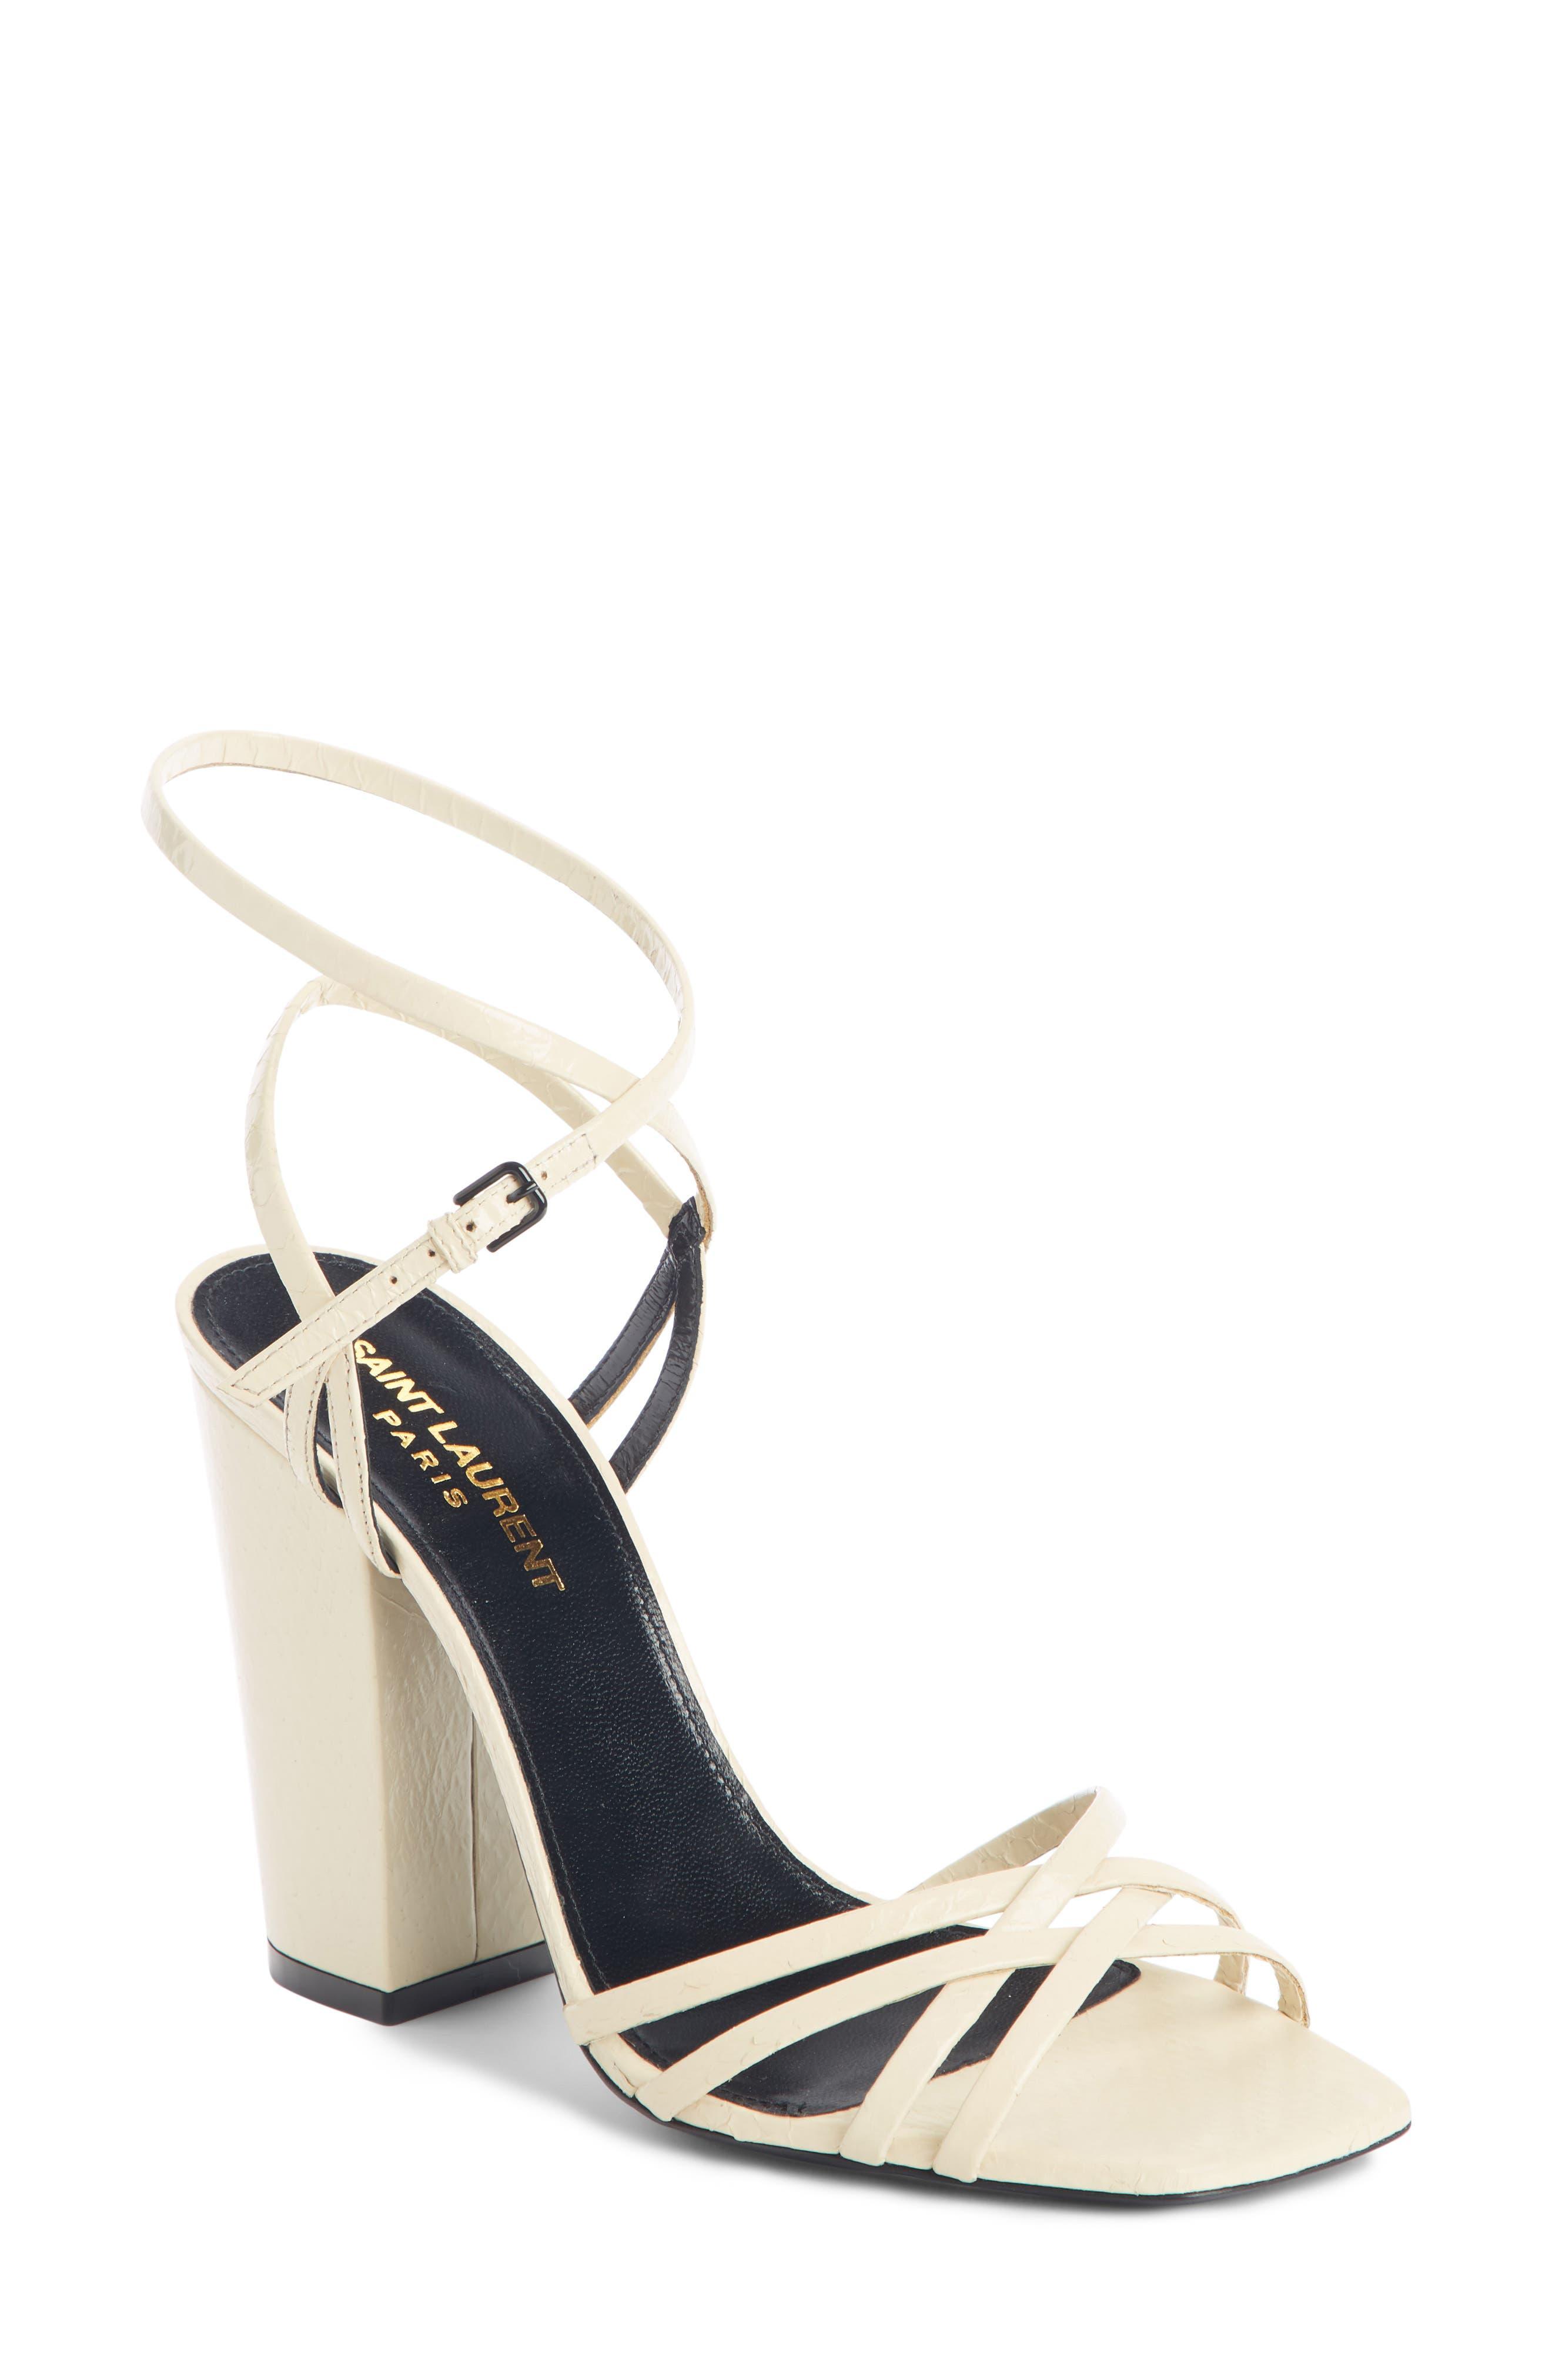 Saint Laurent Oak Crisscross Sandal, Ivory